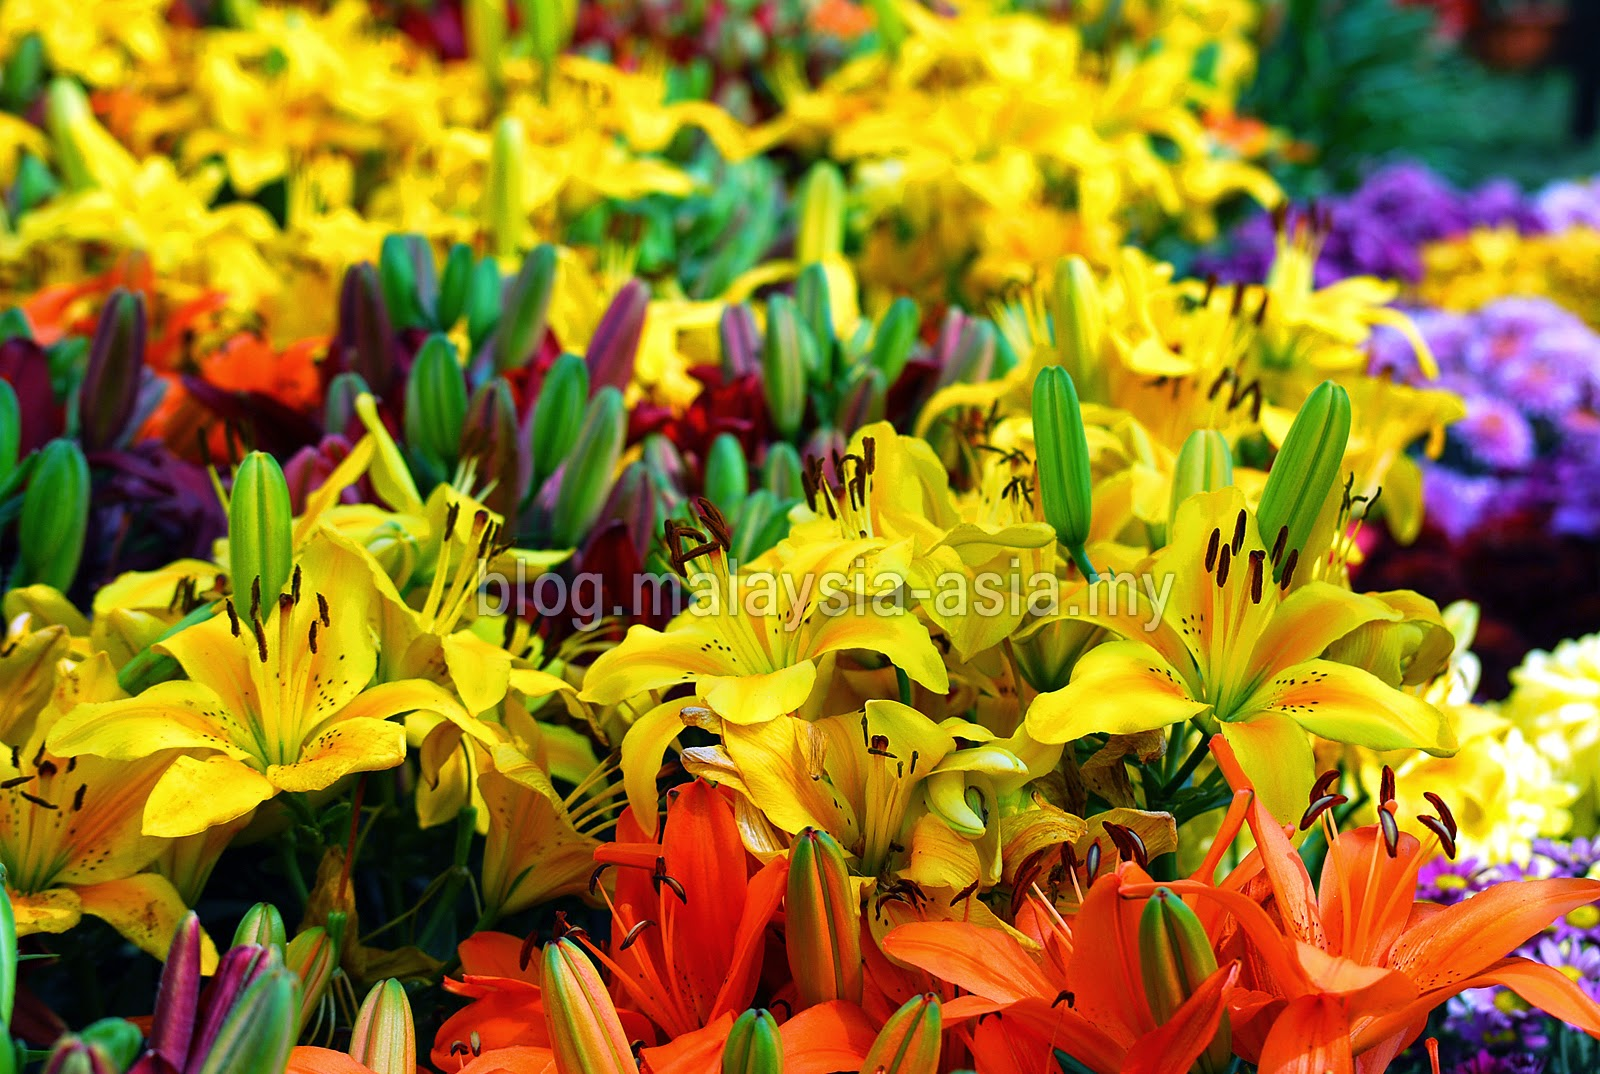 Floral Flower Festival in Penang